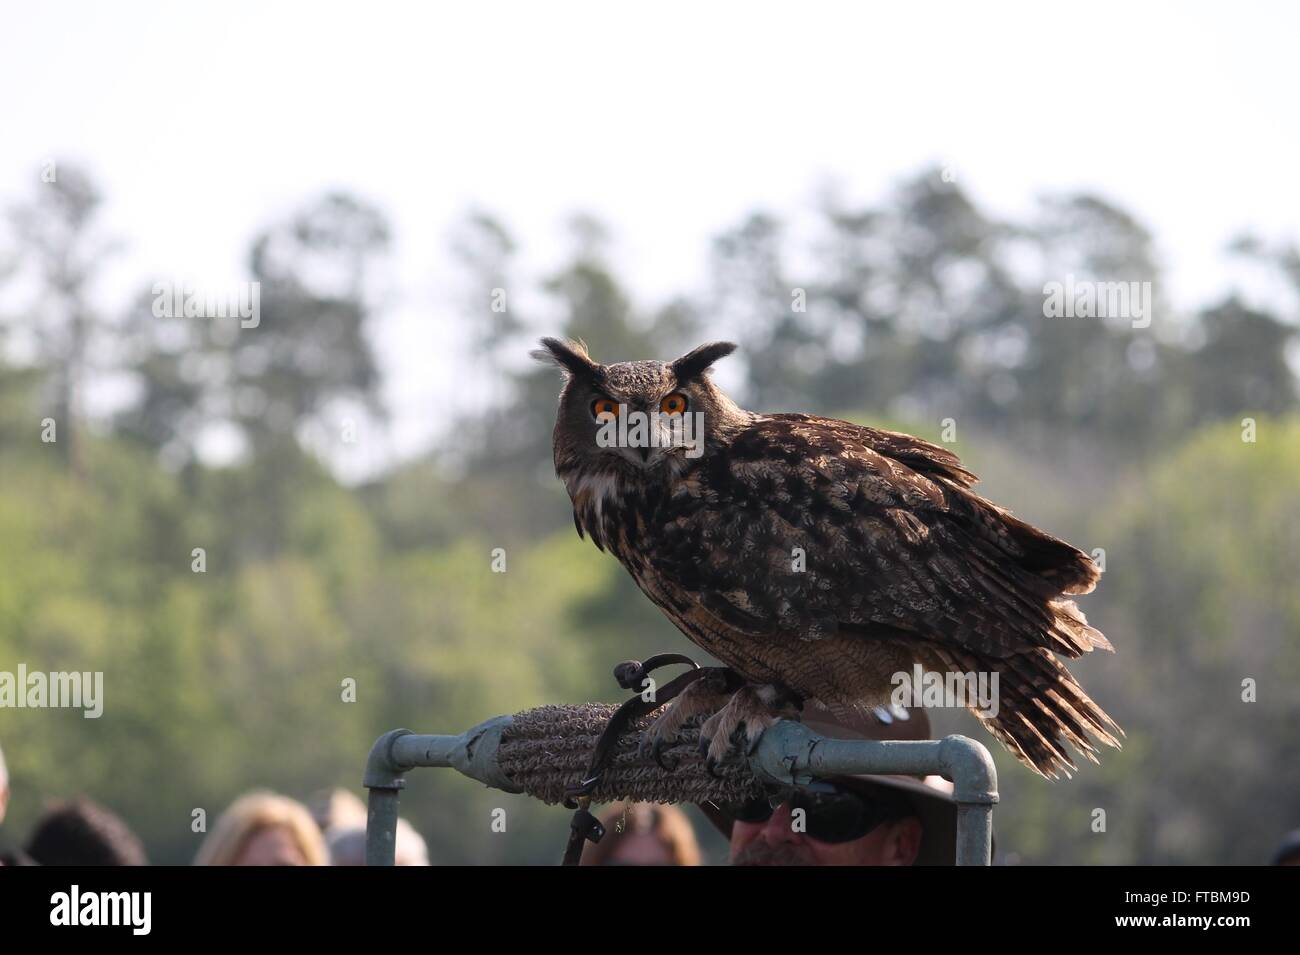 Eurasian eagle owl at Lake Livingston State Park - Stock Image